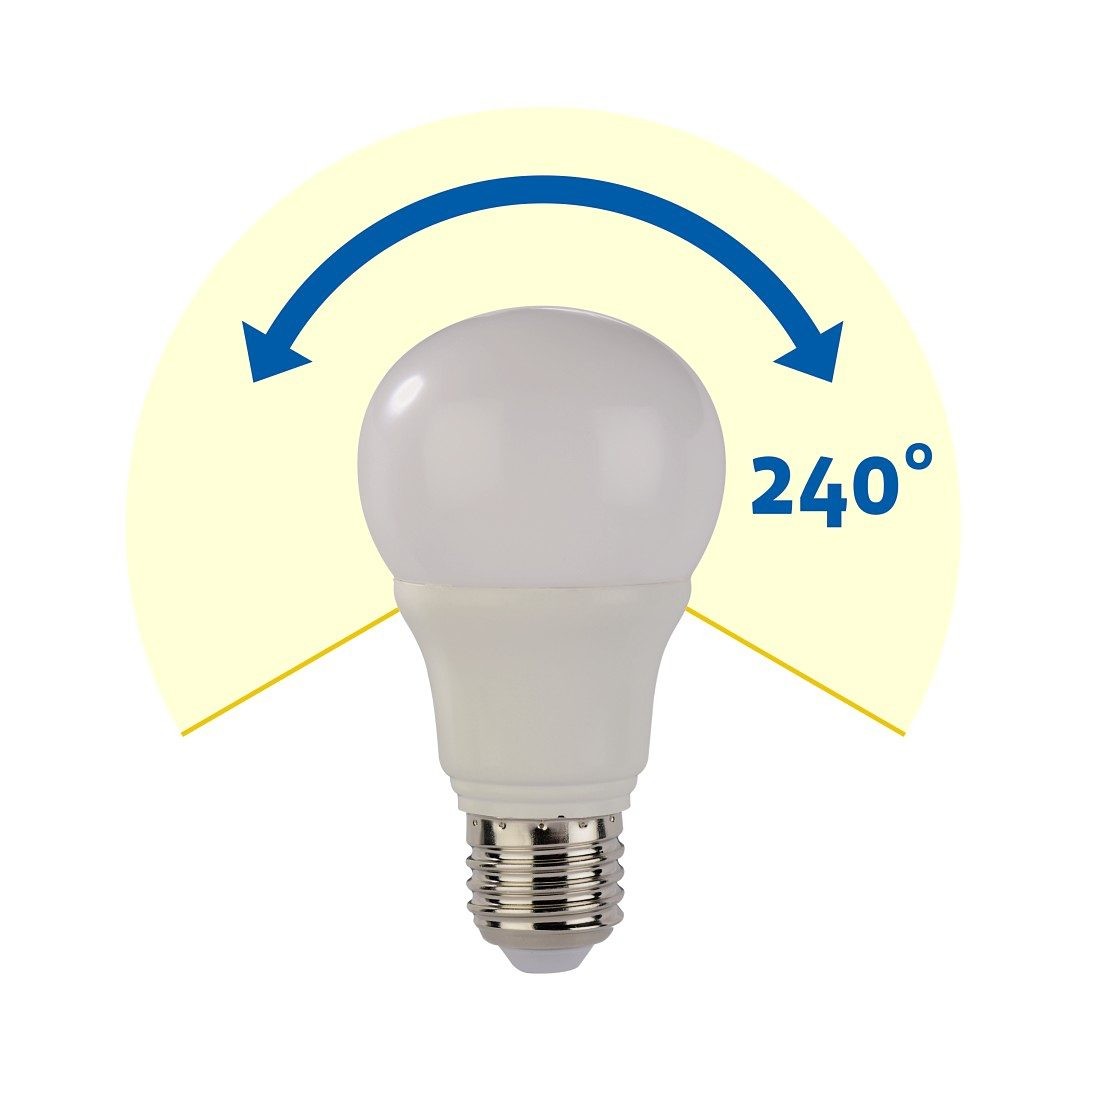 Xavax LED-Lampe, E27, 500lm ersetzt 42W Glühlampe, Warmweiß, dimmbar